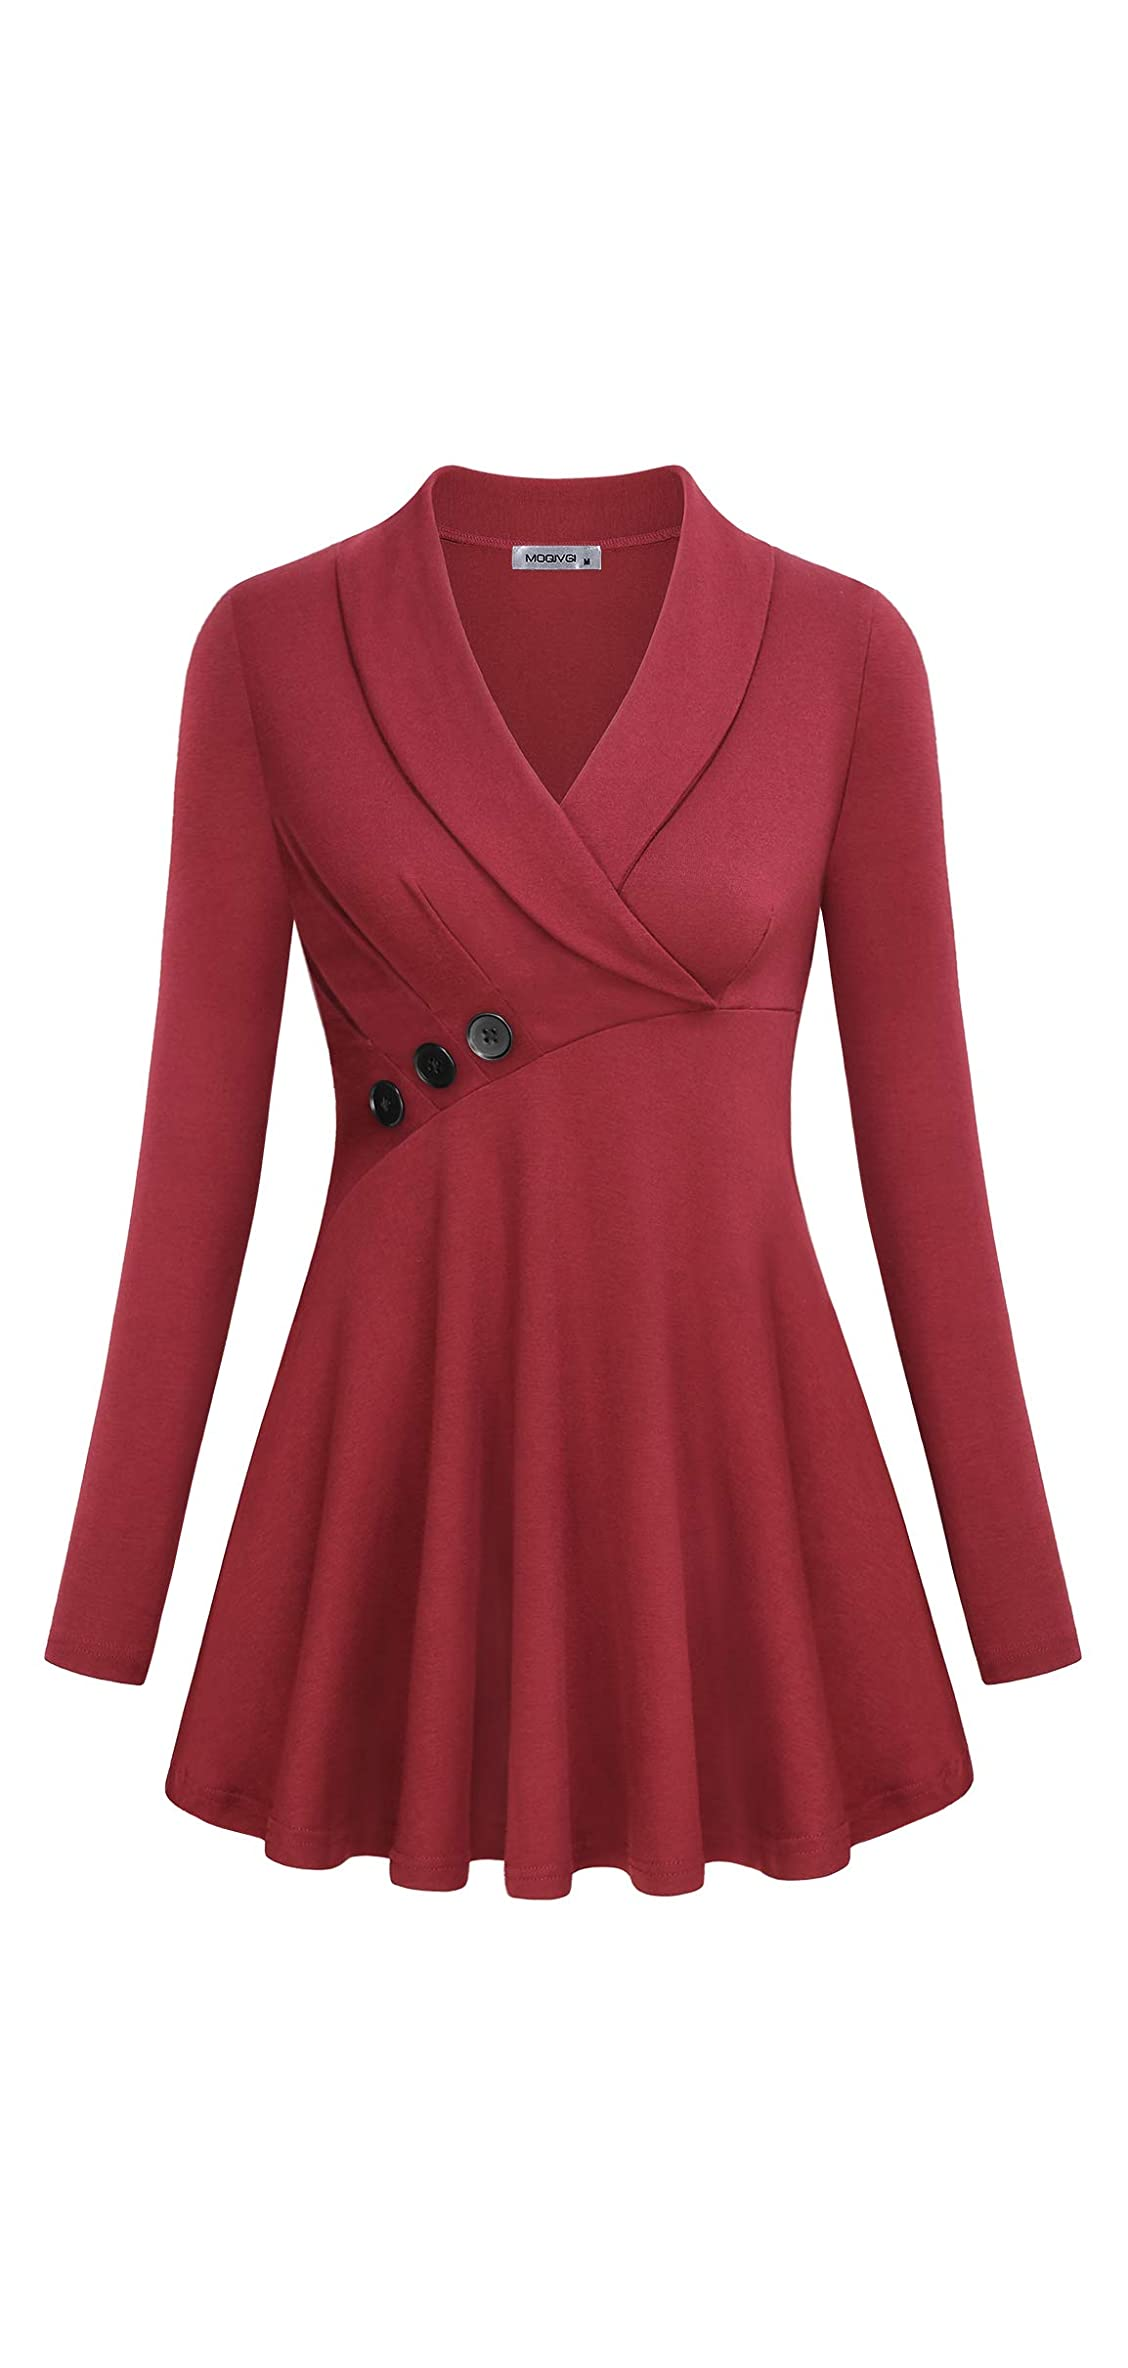 Womens Tops V Neck Long Sleeve Shawl Collar Button Decor